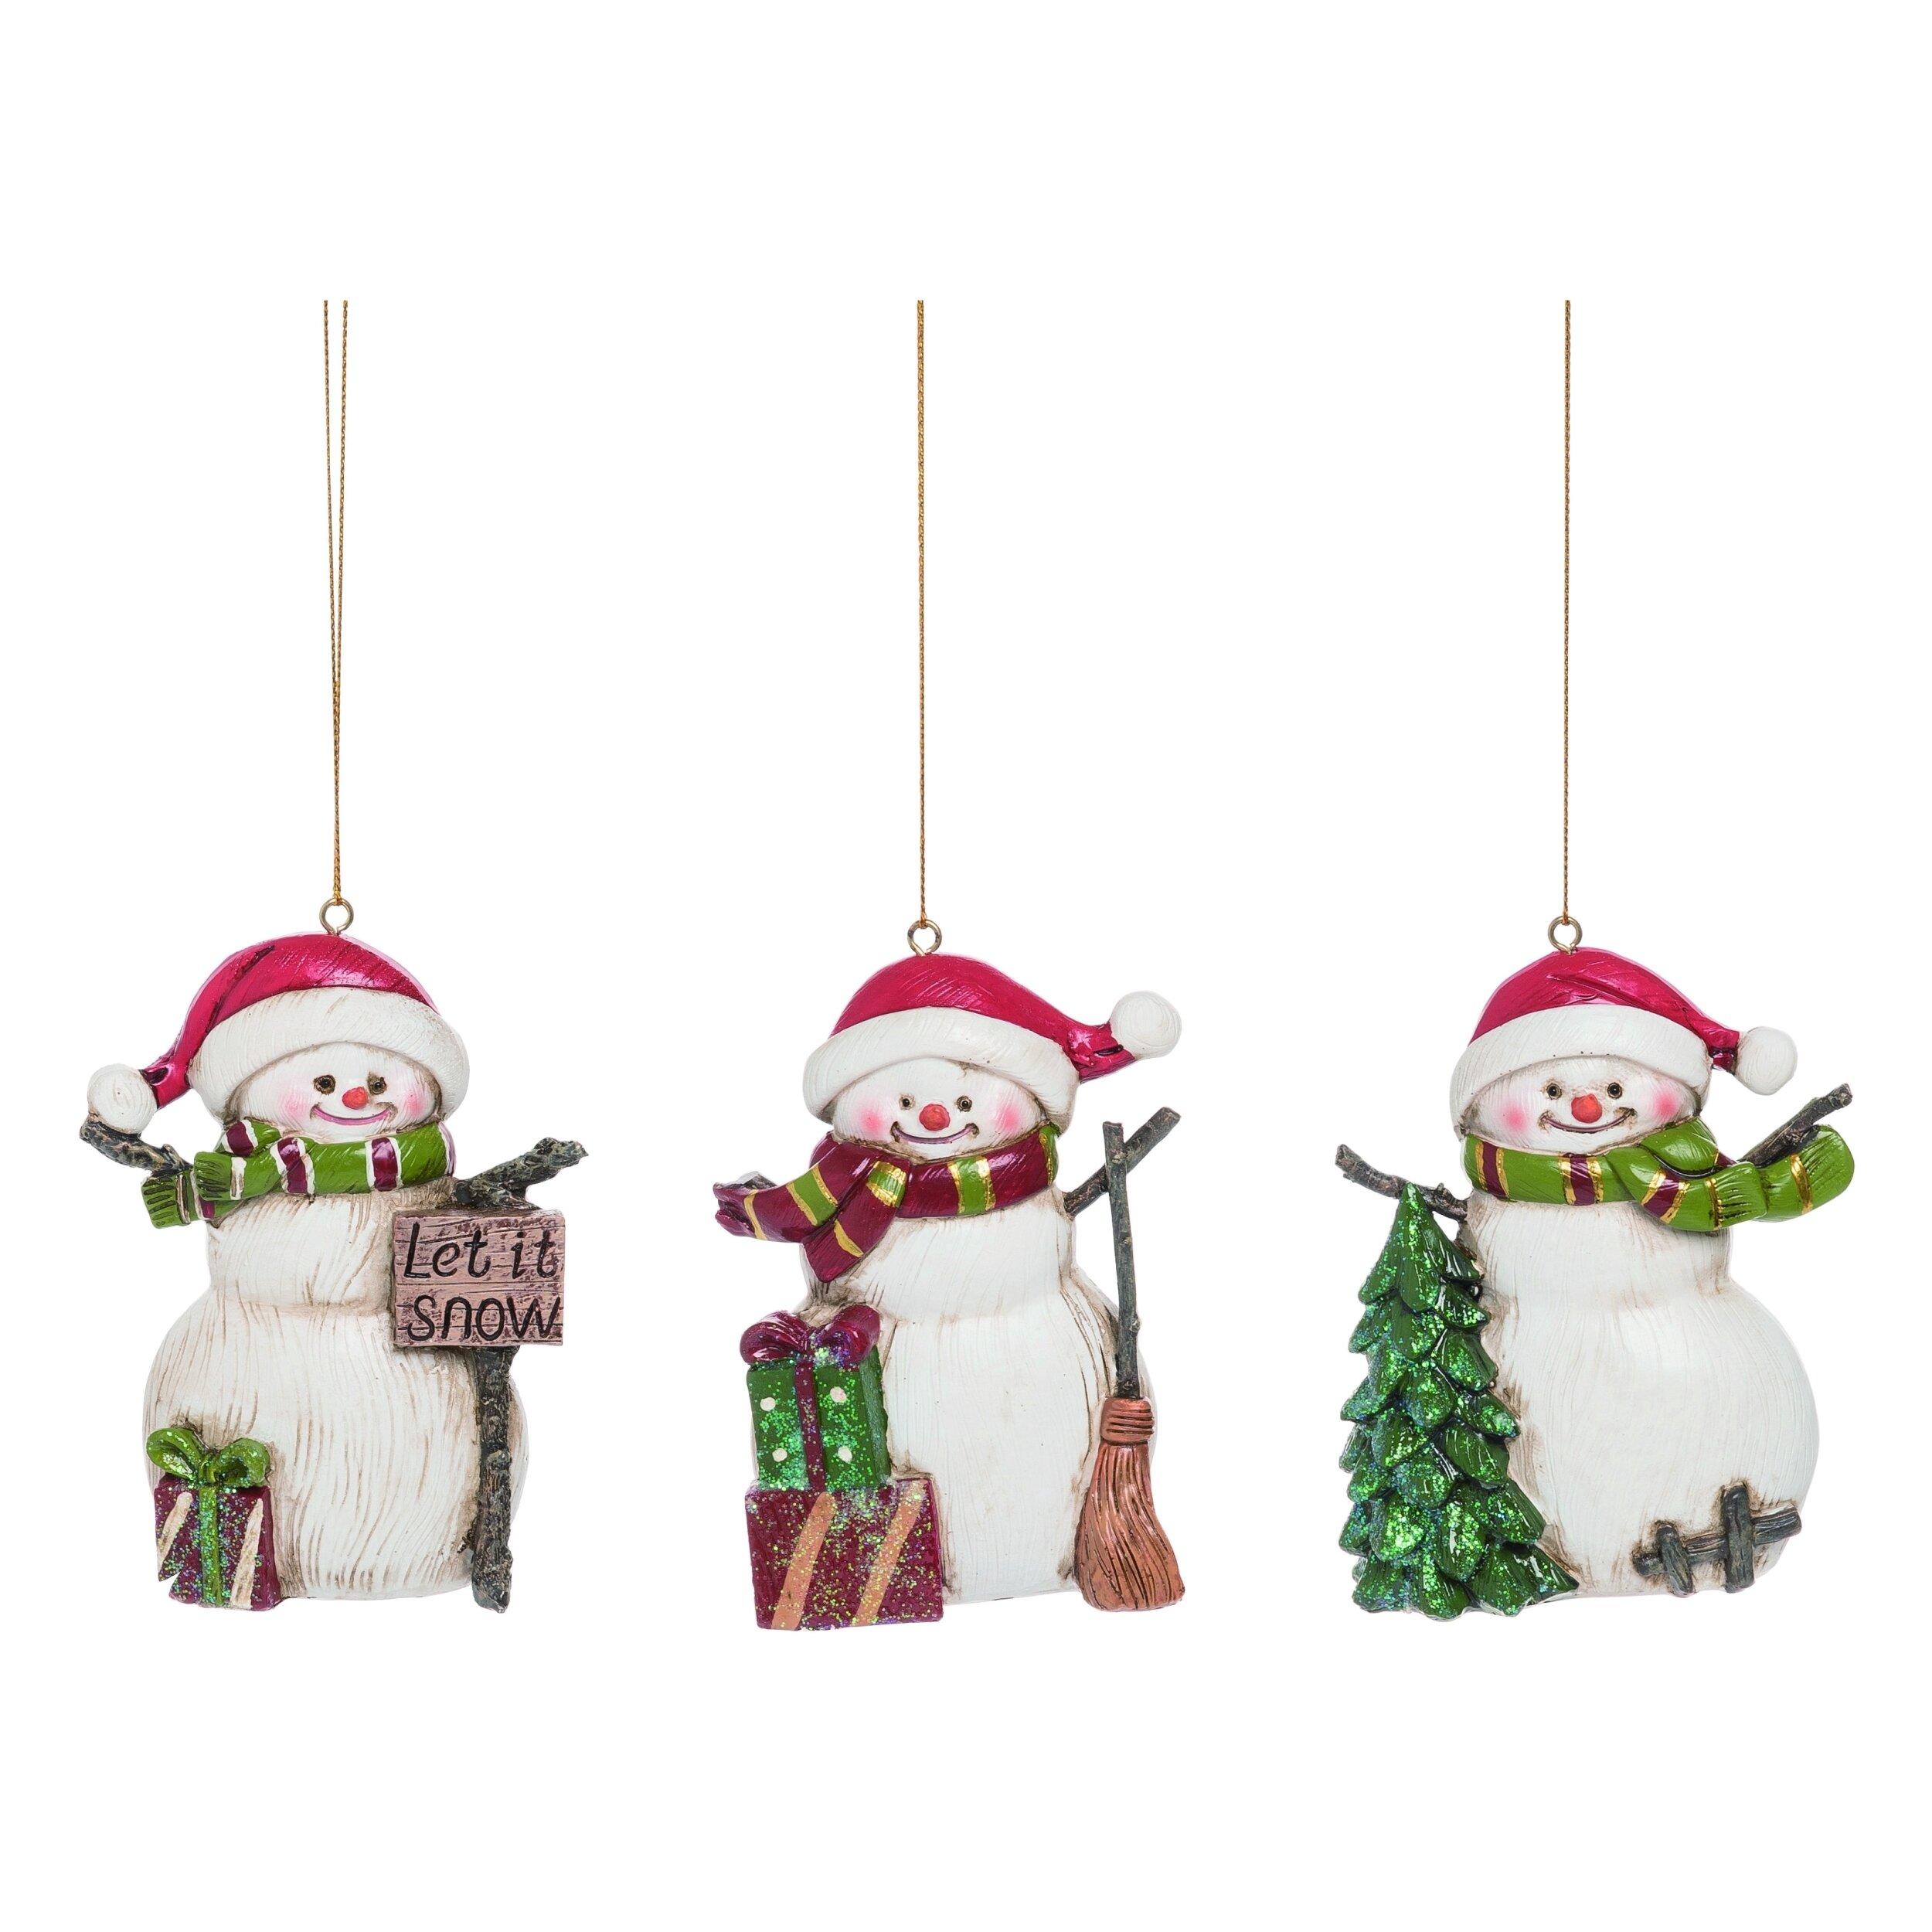 The Holiday Aisle 3 Piece Festive Snowman Hanging Figurine Ornament Set Reviews Wayfair